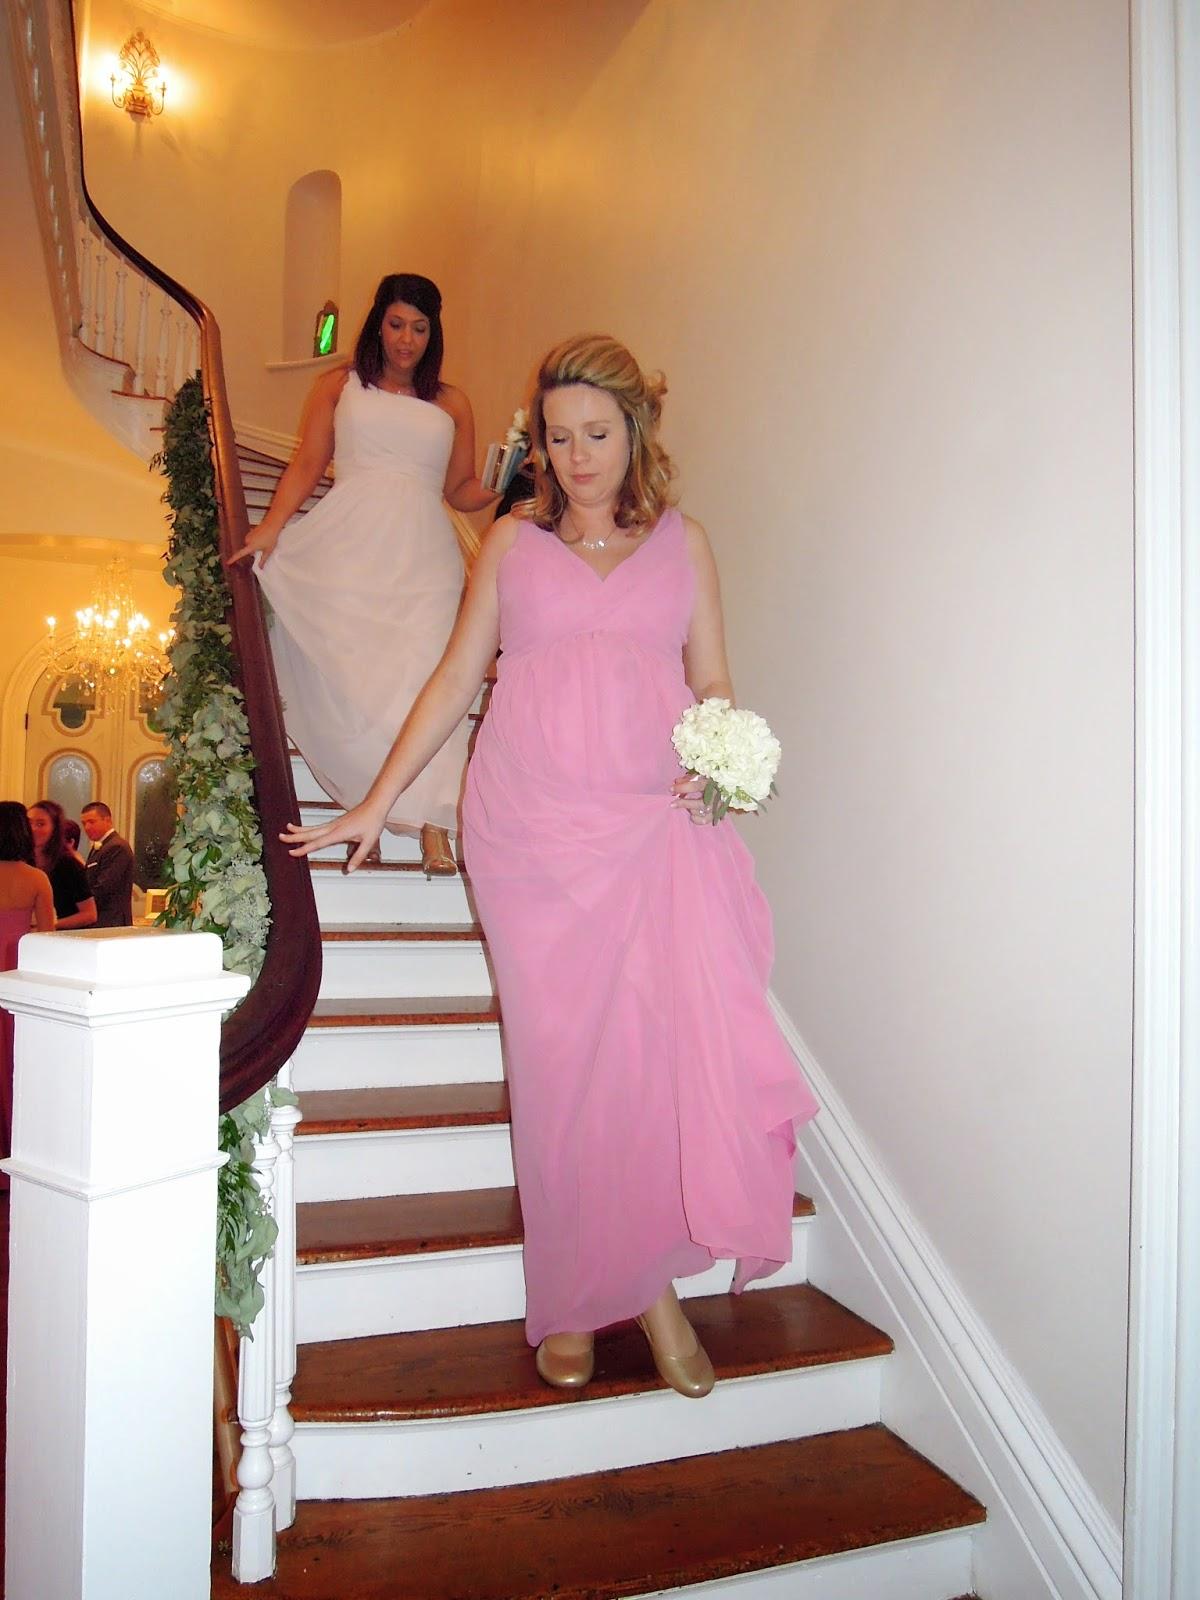 Raleigh Wedding Blog: 2014